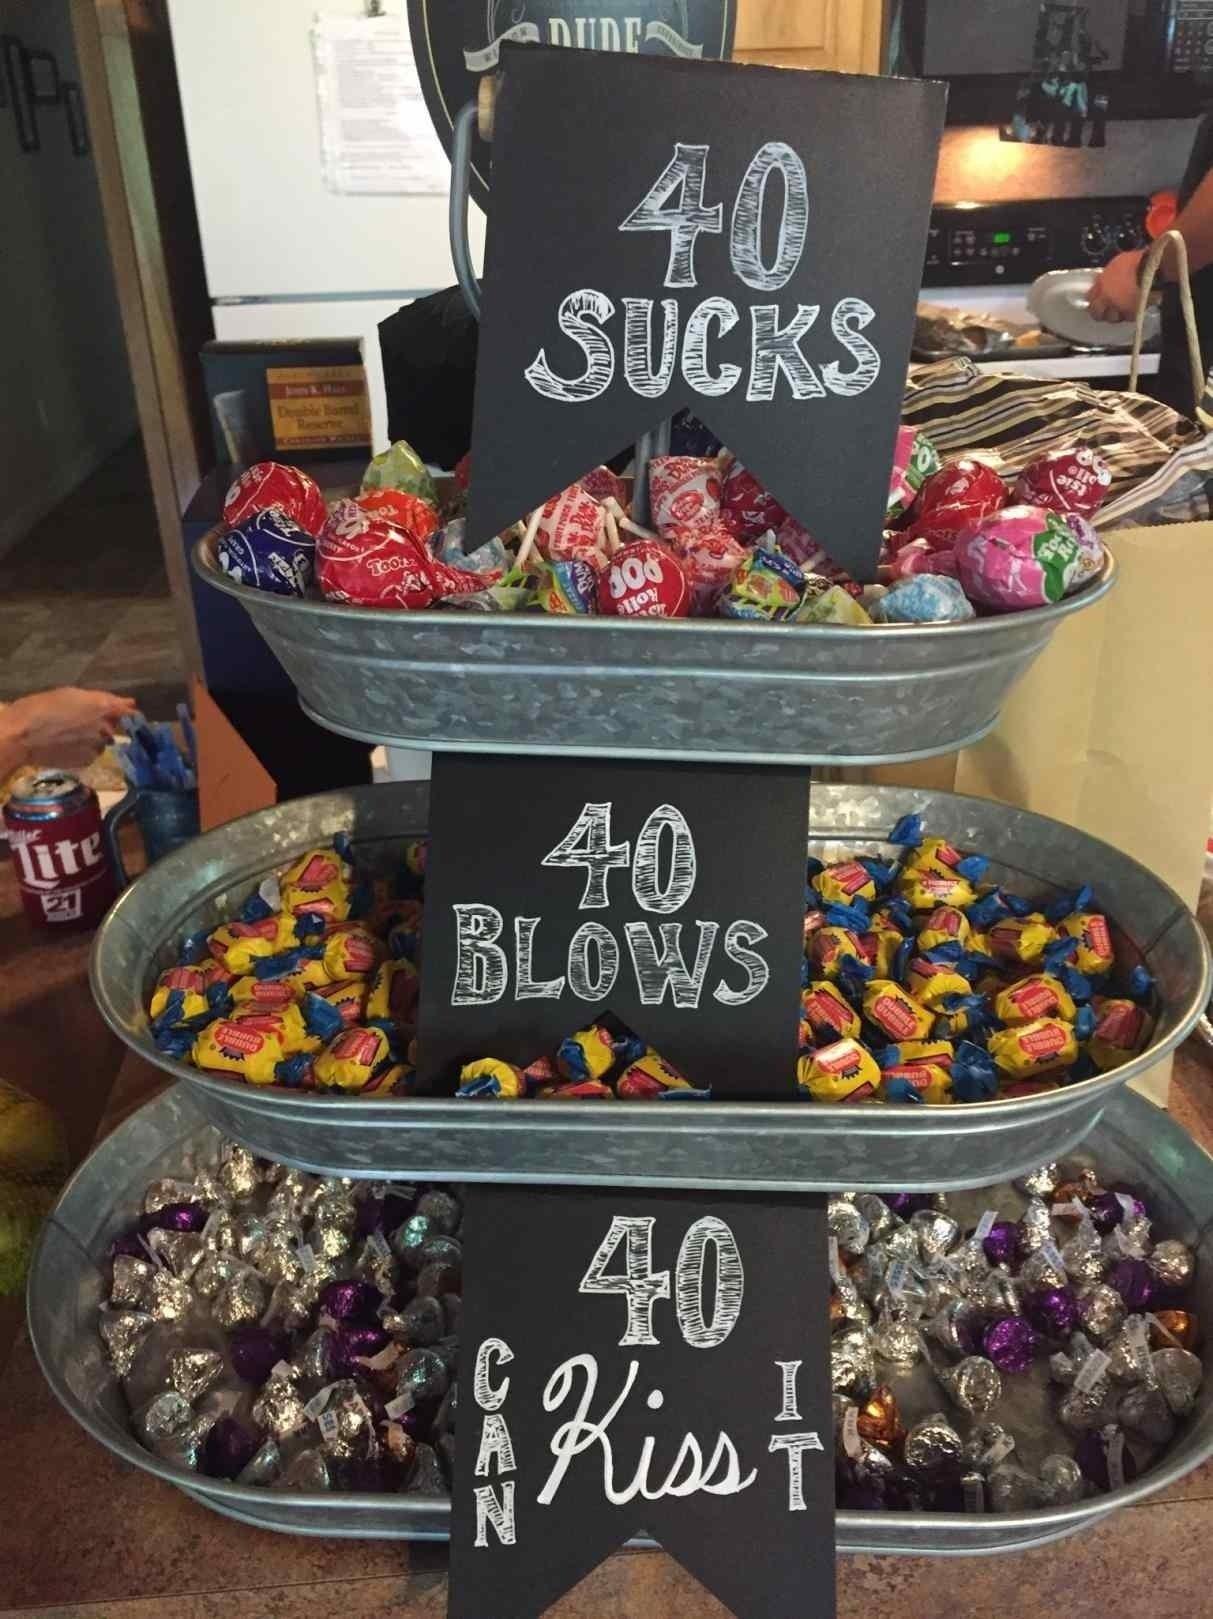 10 Stylish Birthday Party Ideas For Husband 60th birthday party ideas for husband siudy 2020